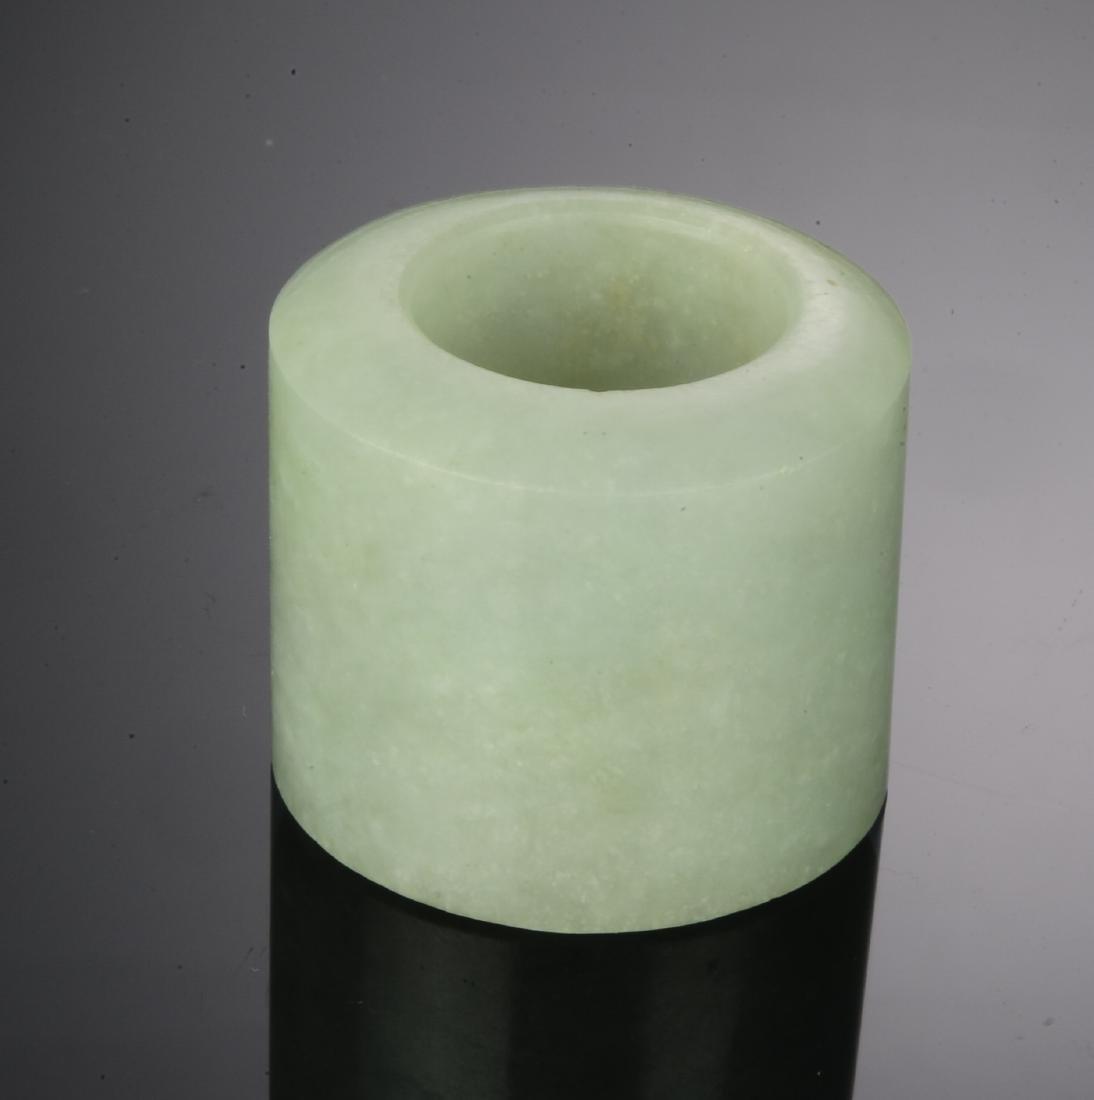 (6) Chinese Jade & Stone Archers Rings 18 - 19 C. - 9